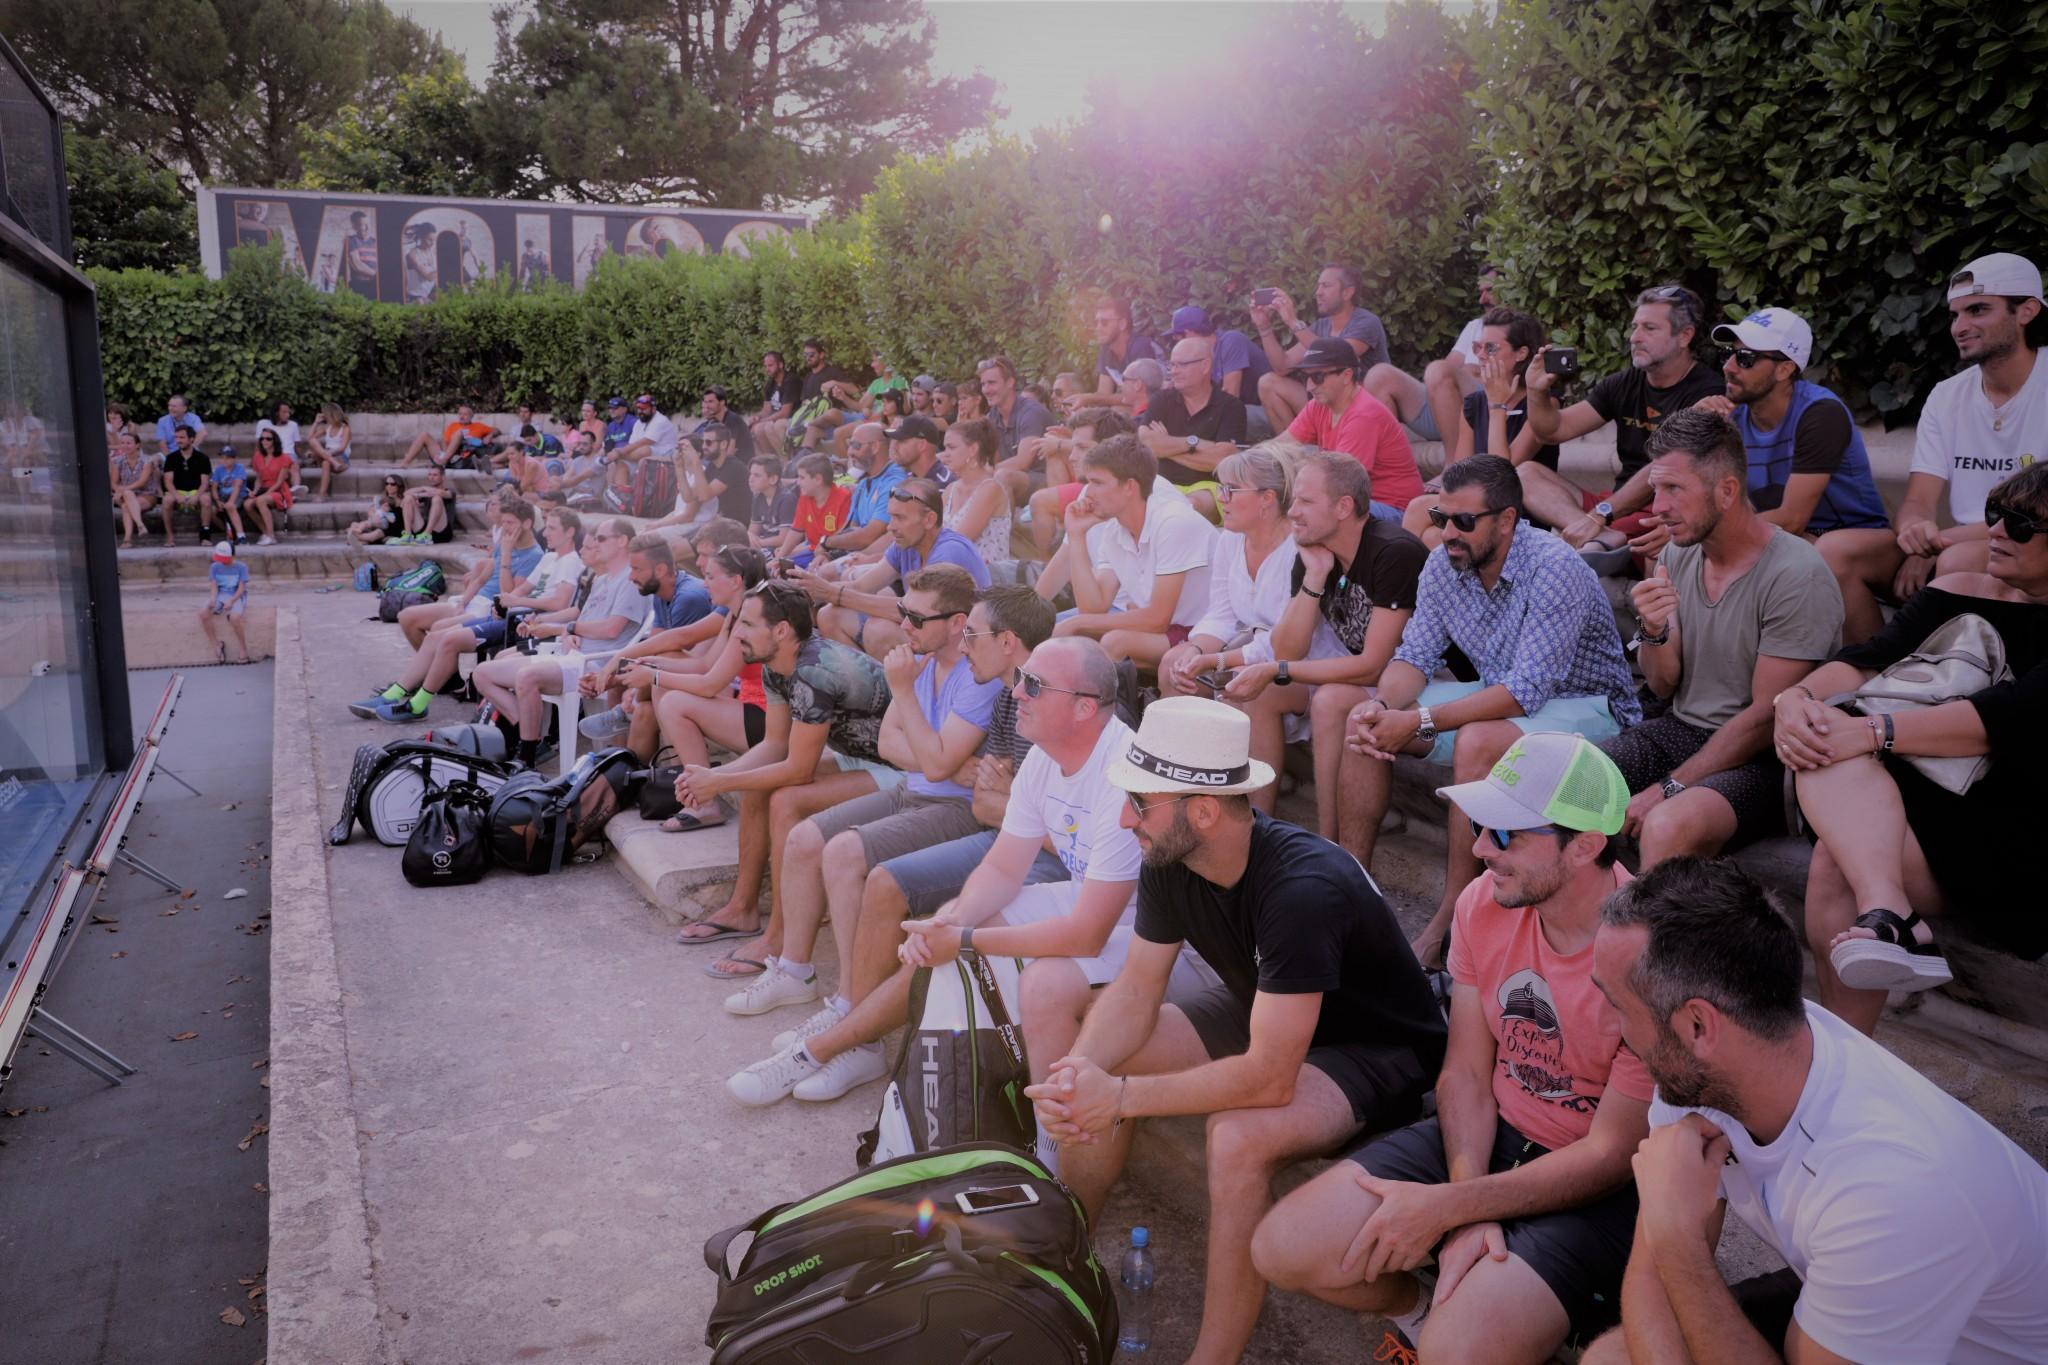 Head Padel Open 2019 - Finais Masculinos - Tison / Maigret vs. Scatena / Haziza - WinWin Padel Arbois